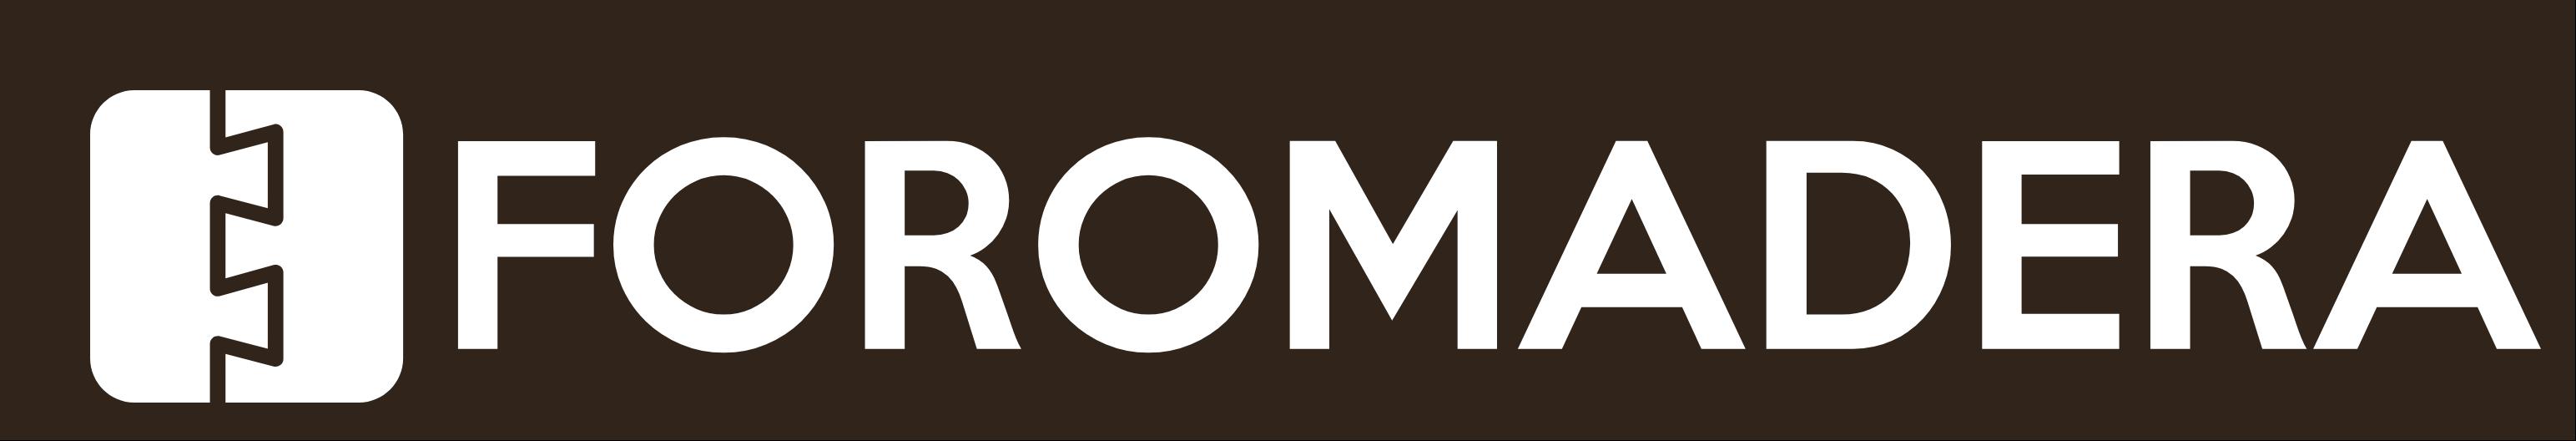 Foromadera